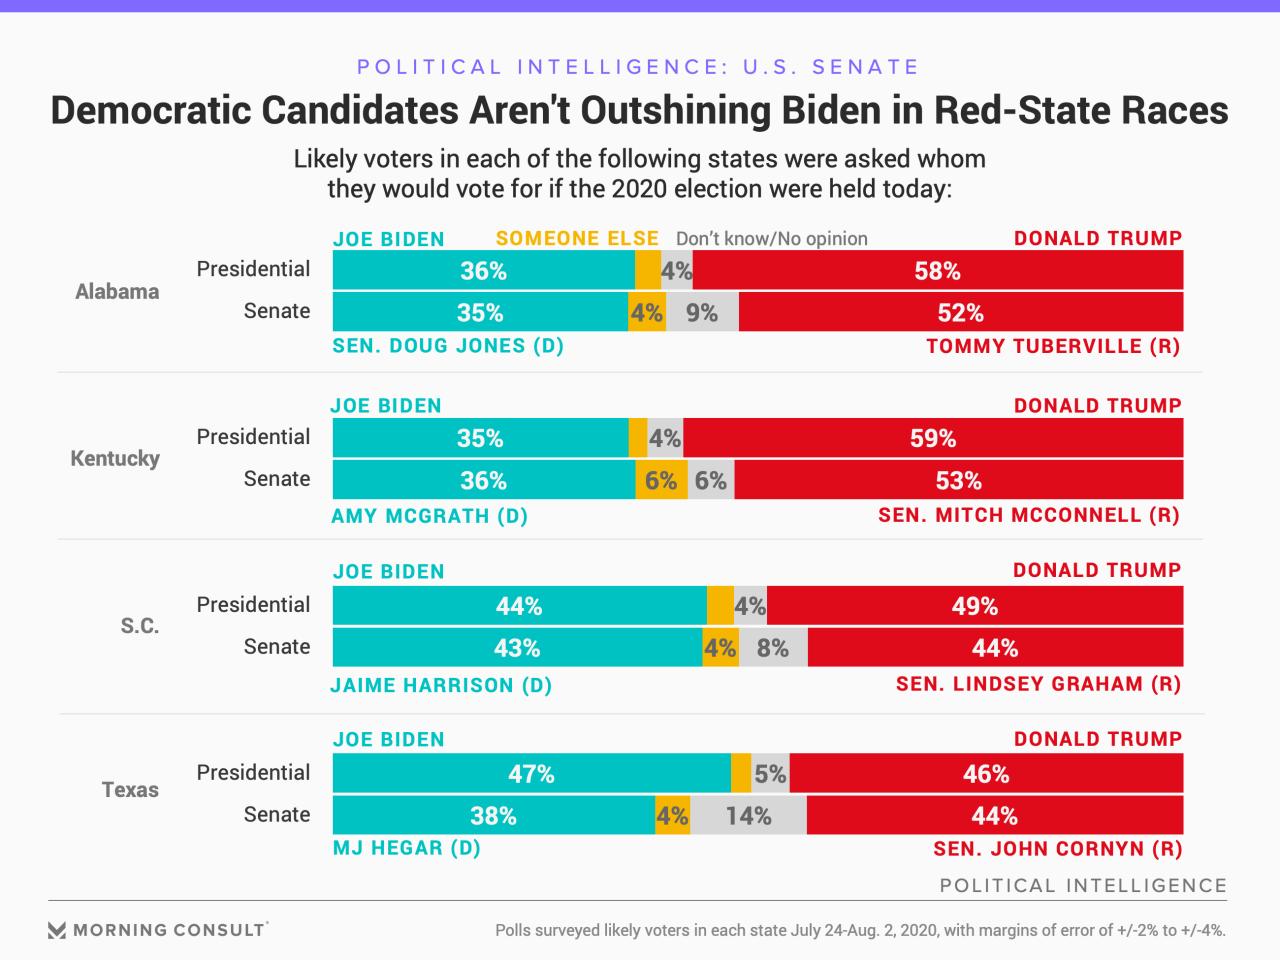 200803_Presidential-Senate-State-Polling_FULLWIDTH.jpg